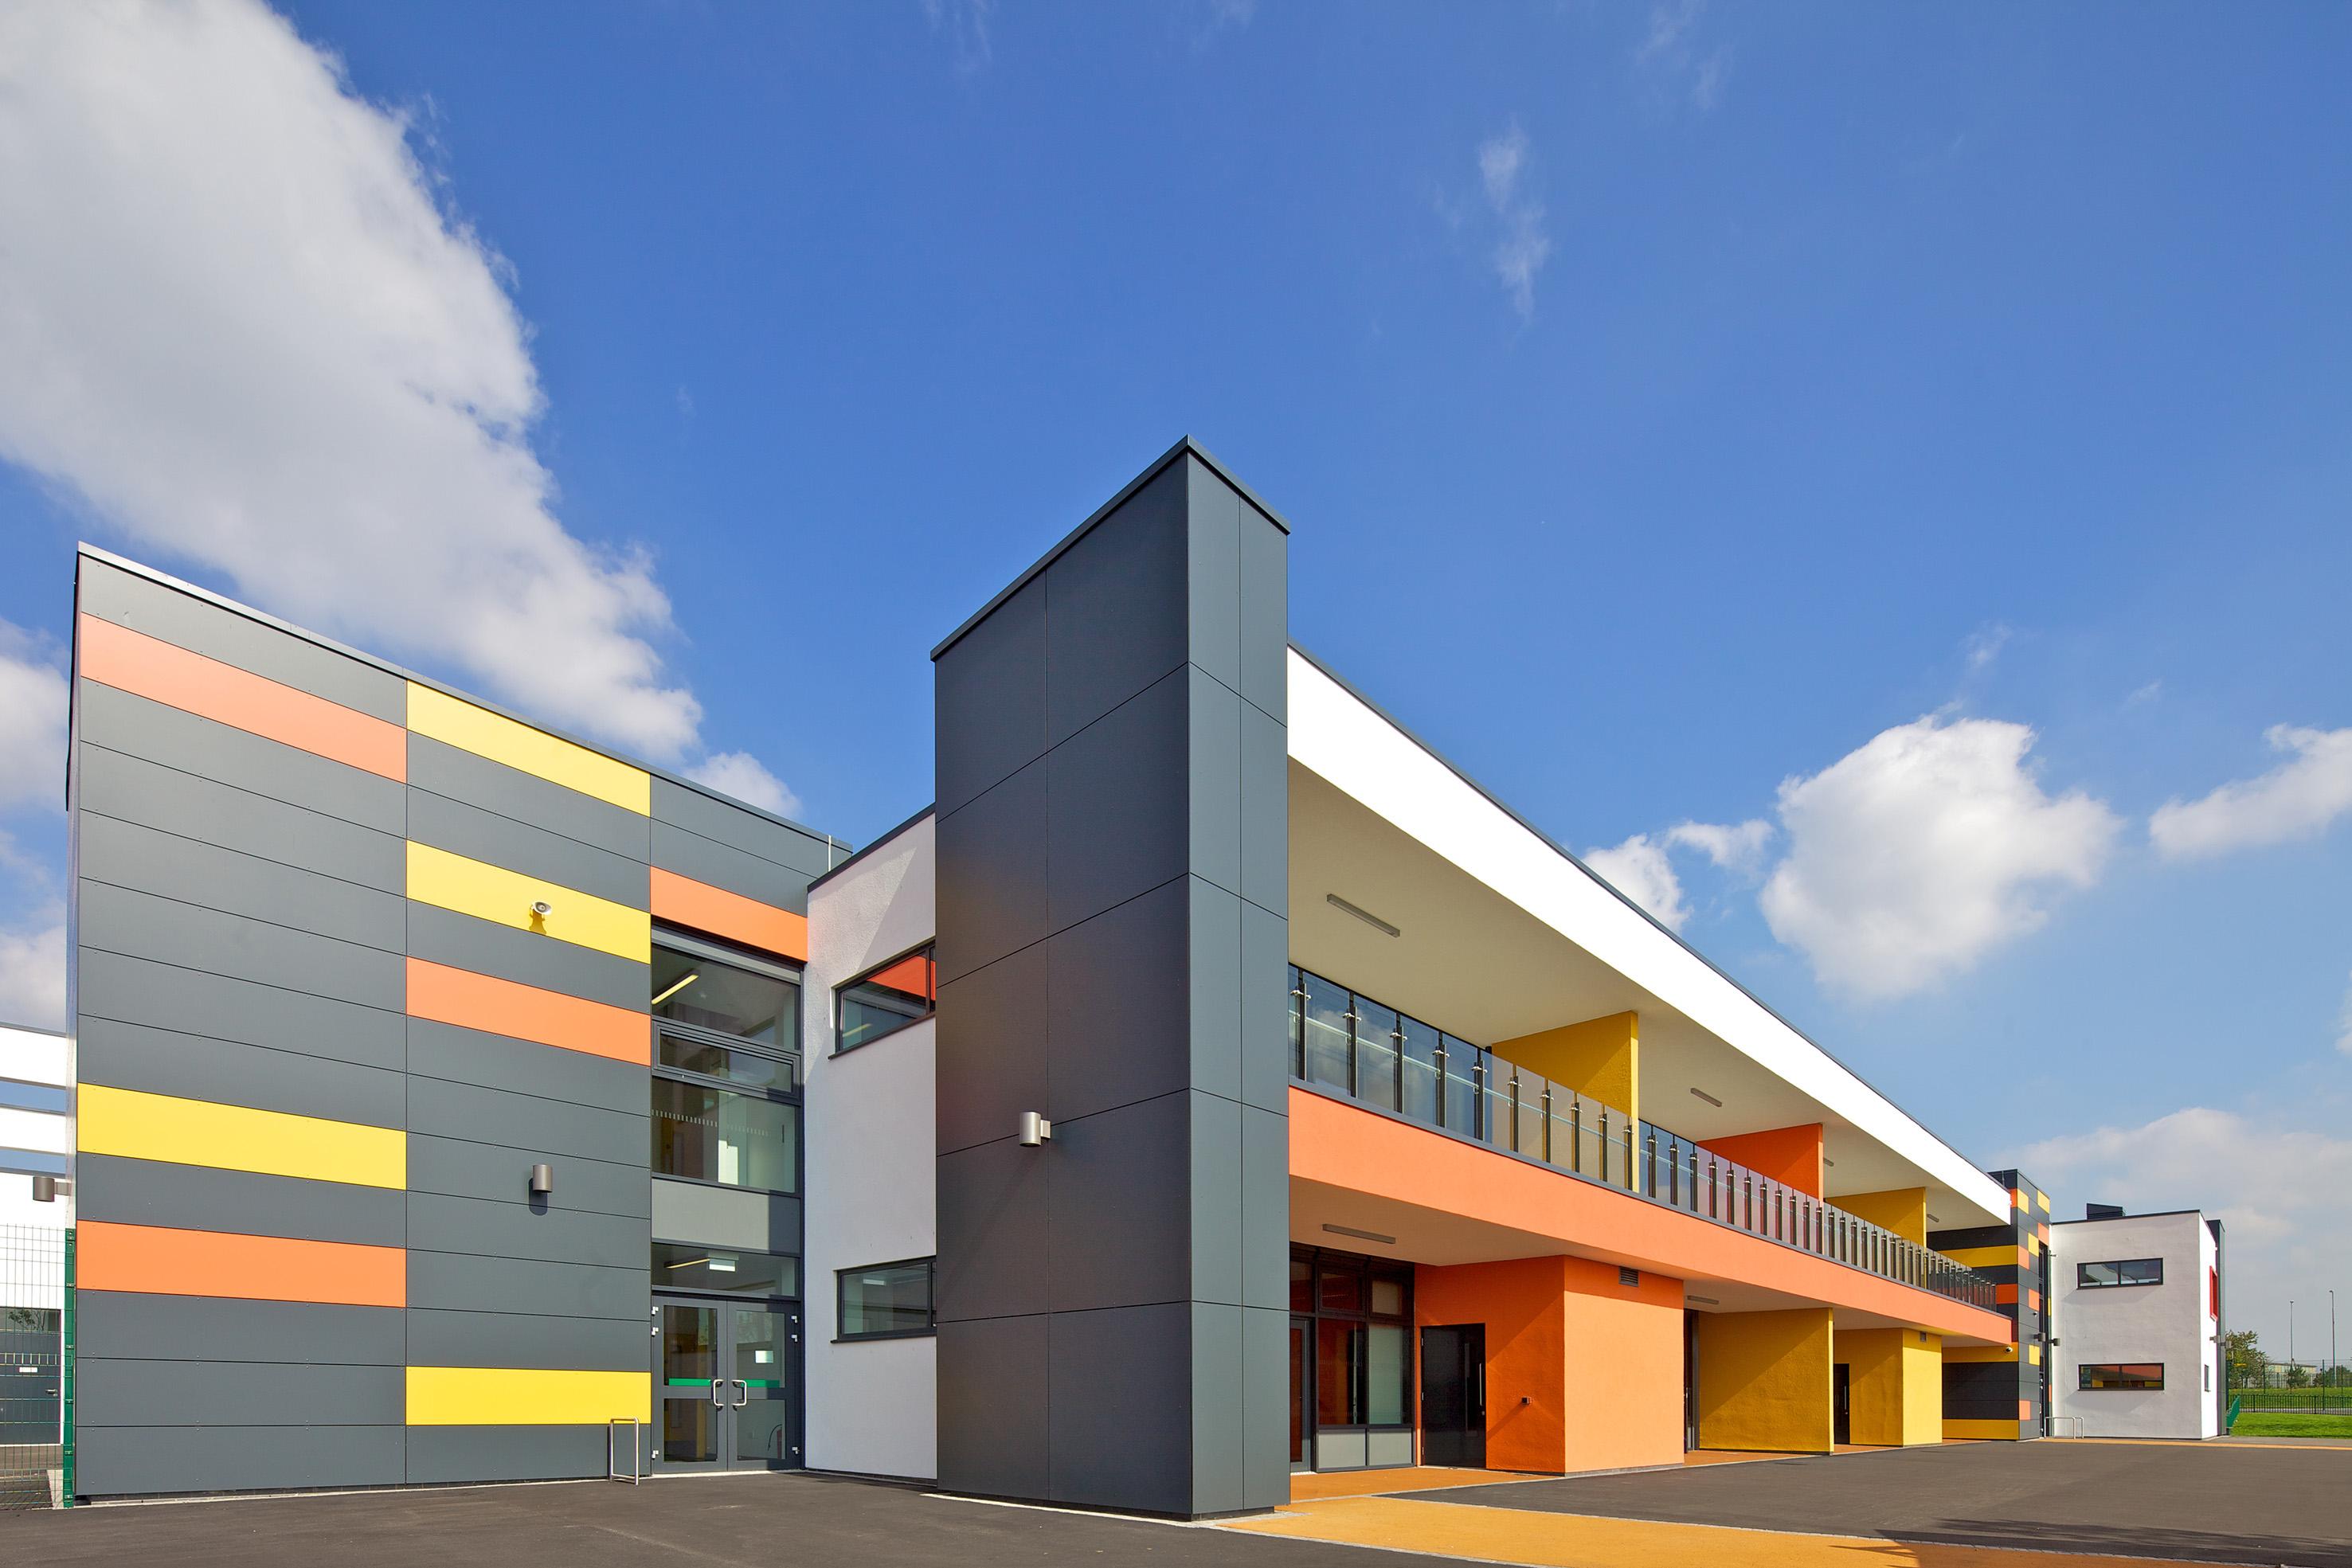 Park Brow School Liverpool